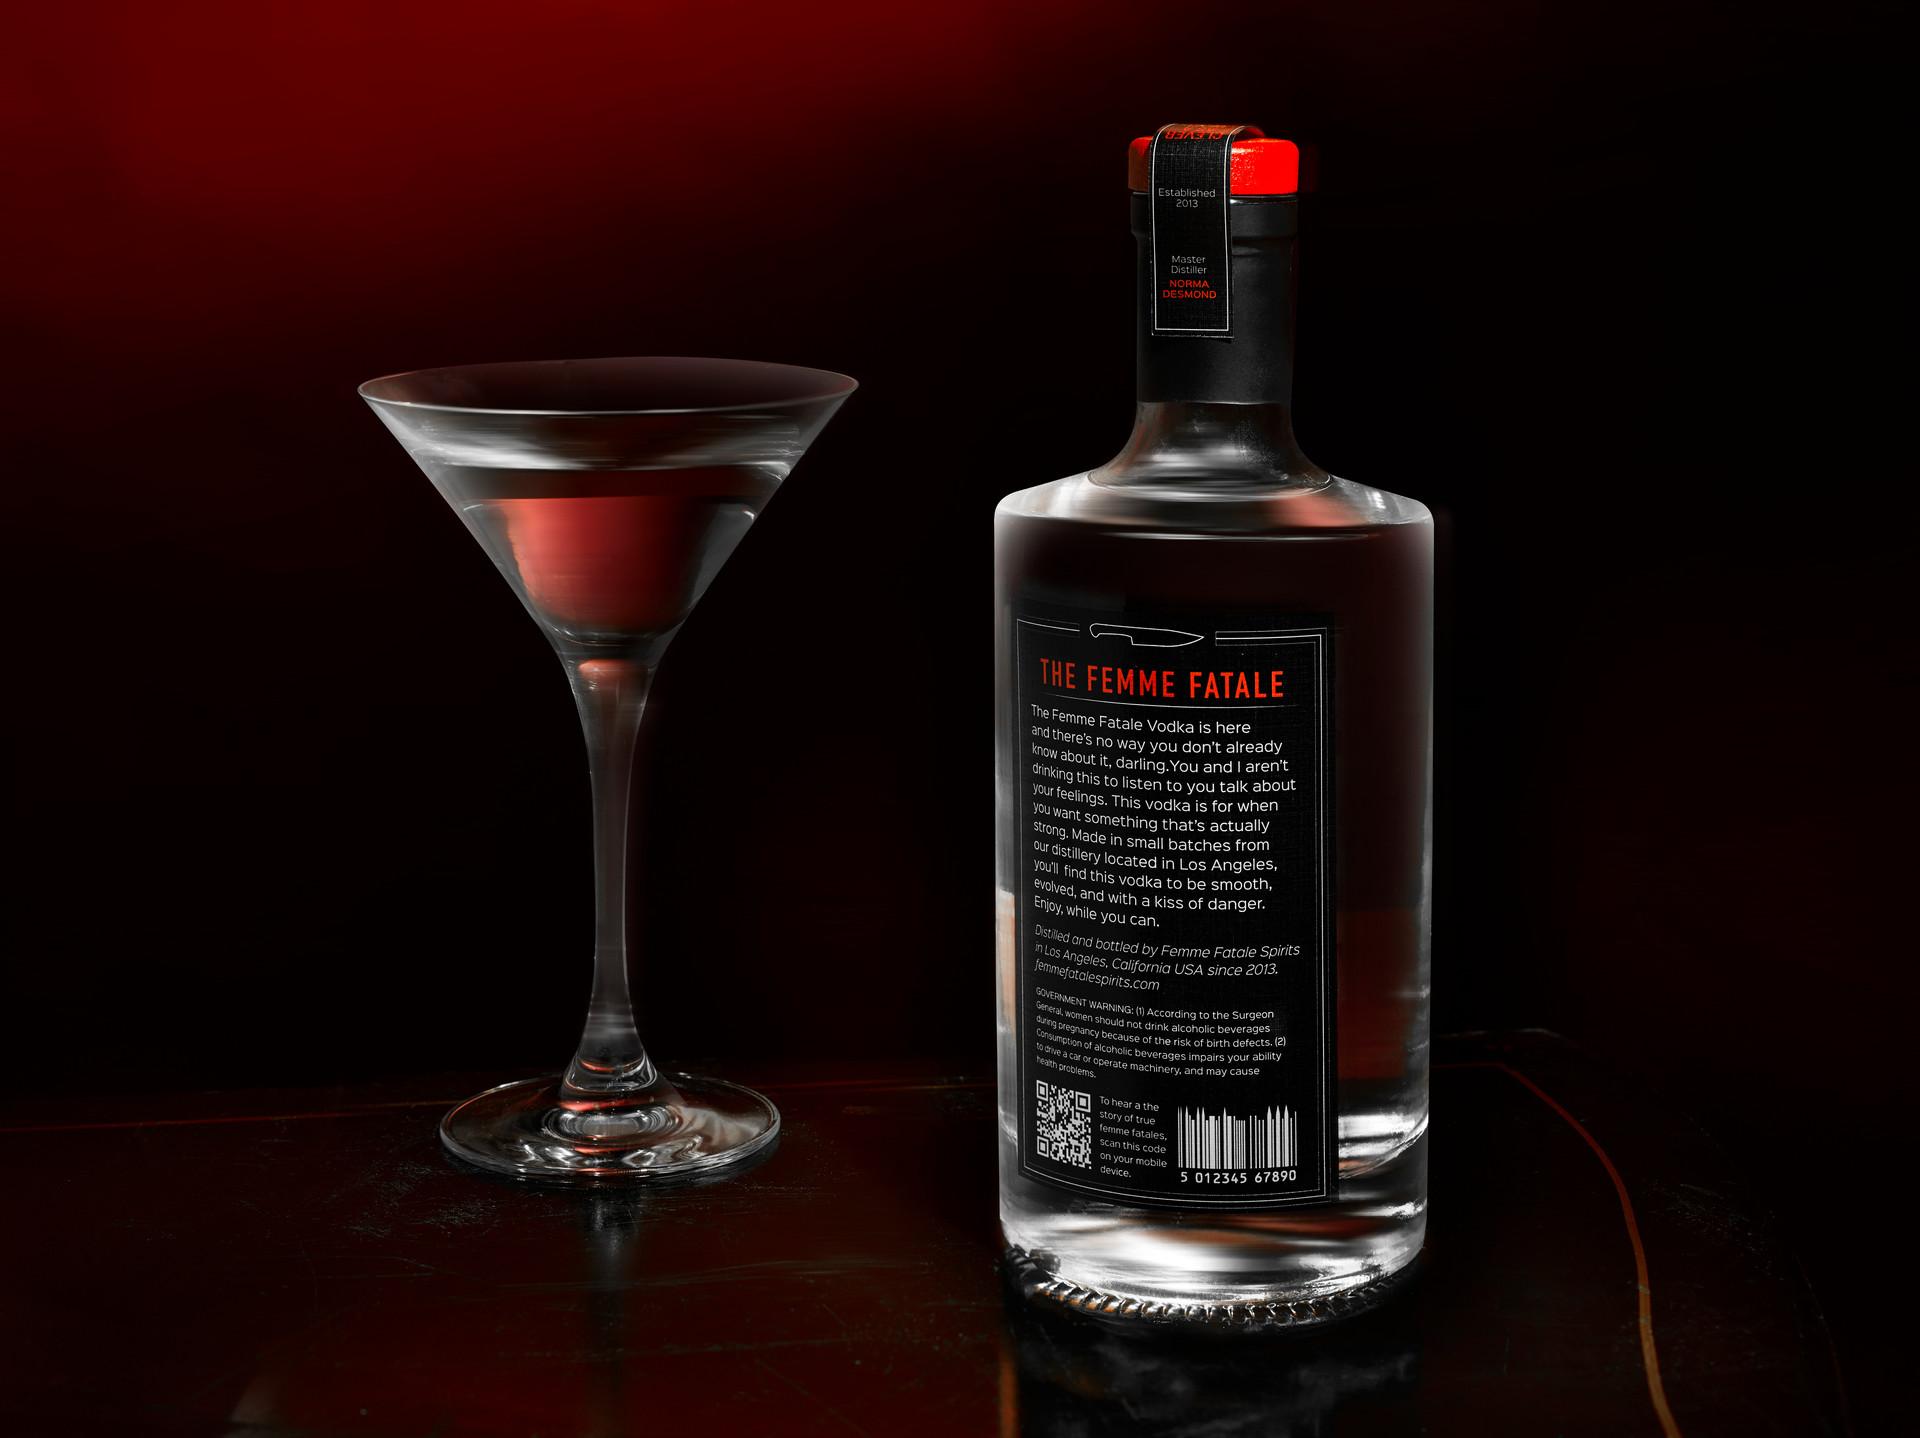 Kimia Fariborz the Femme Fatale Vodka